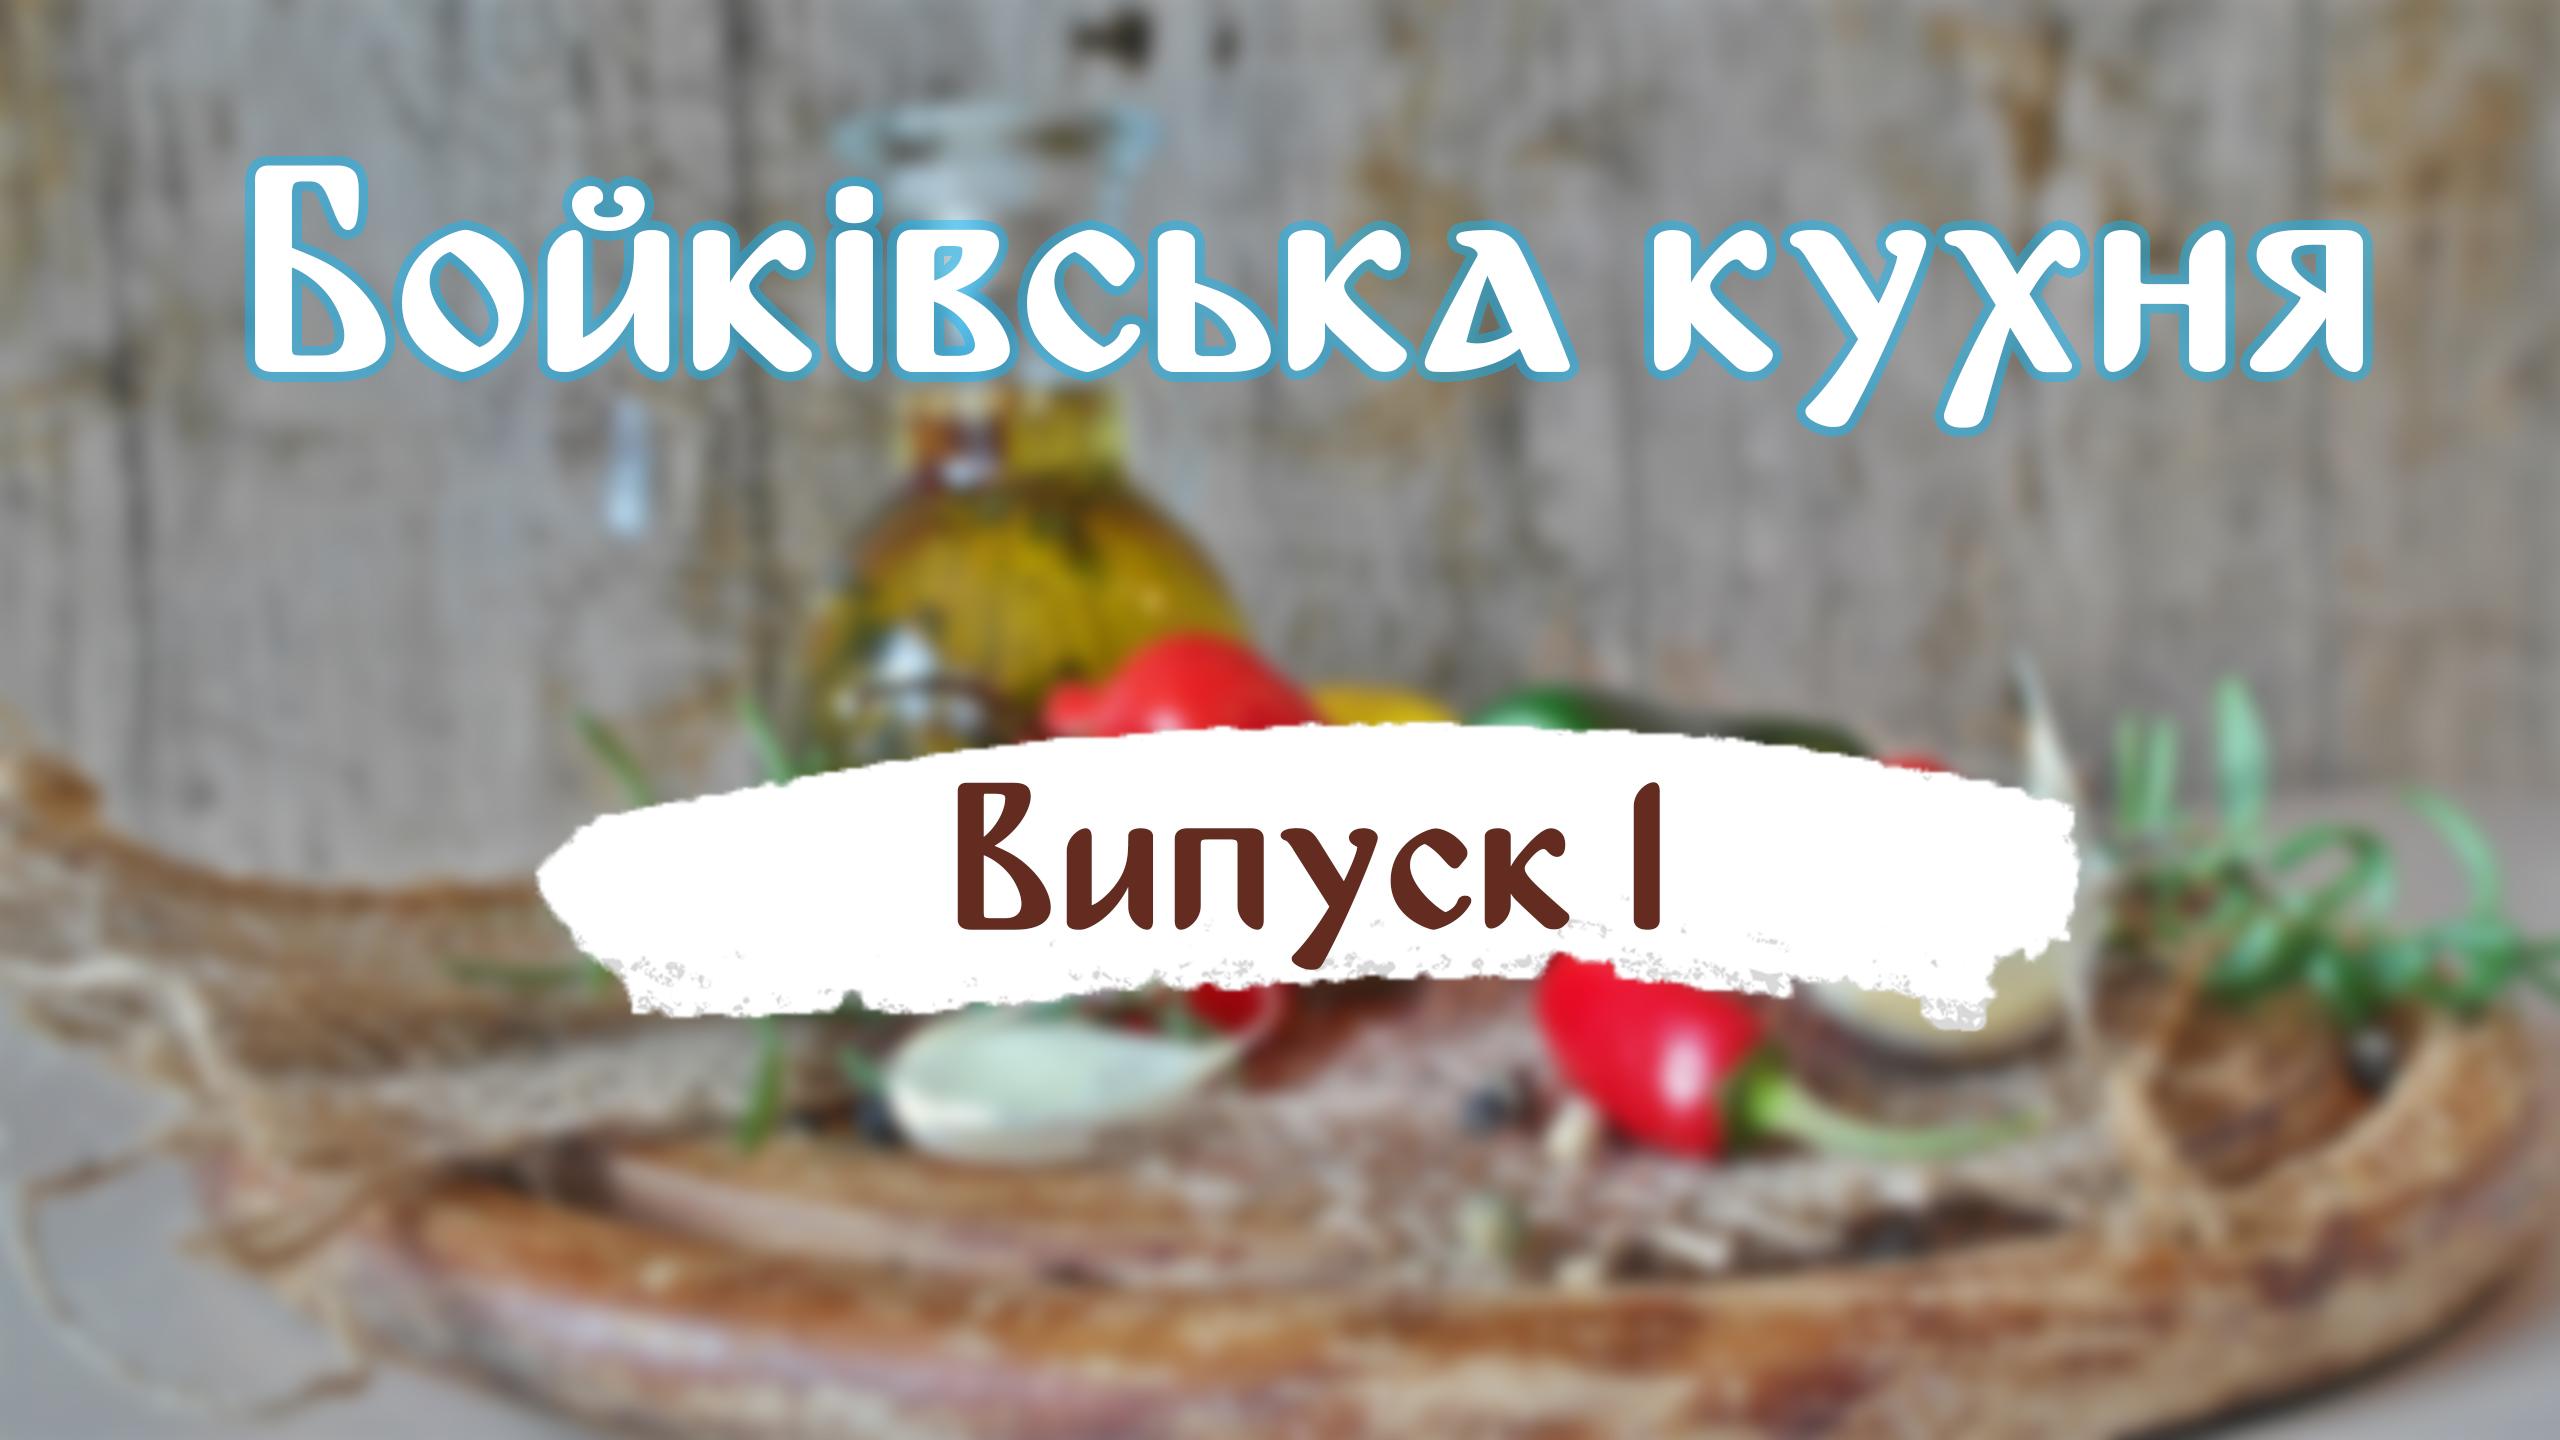 Read more about the article Бойківська кухня. Випуск 1. Квашений борщ.